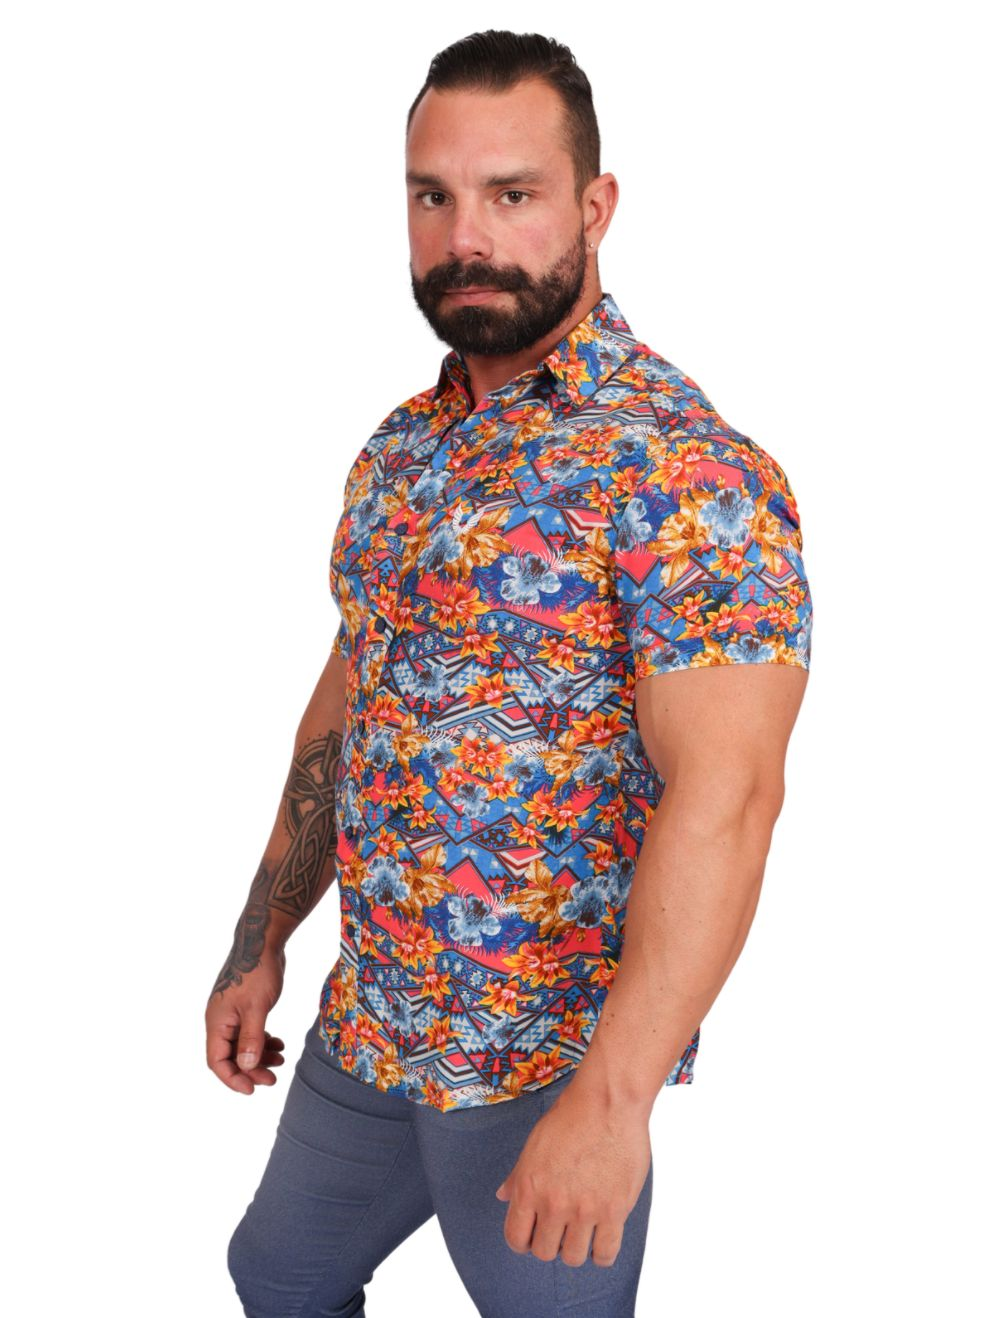 Camisa Masculina Manga Curta Floral Multicolor Slim